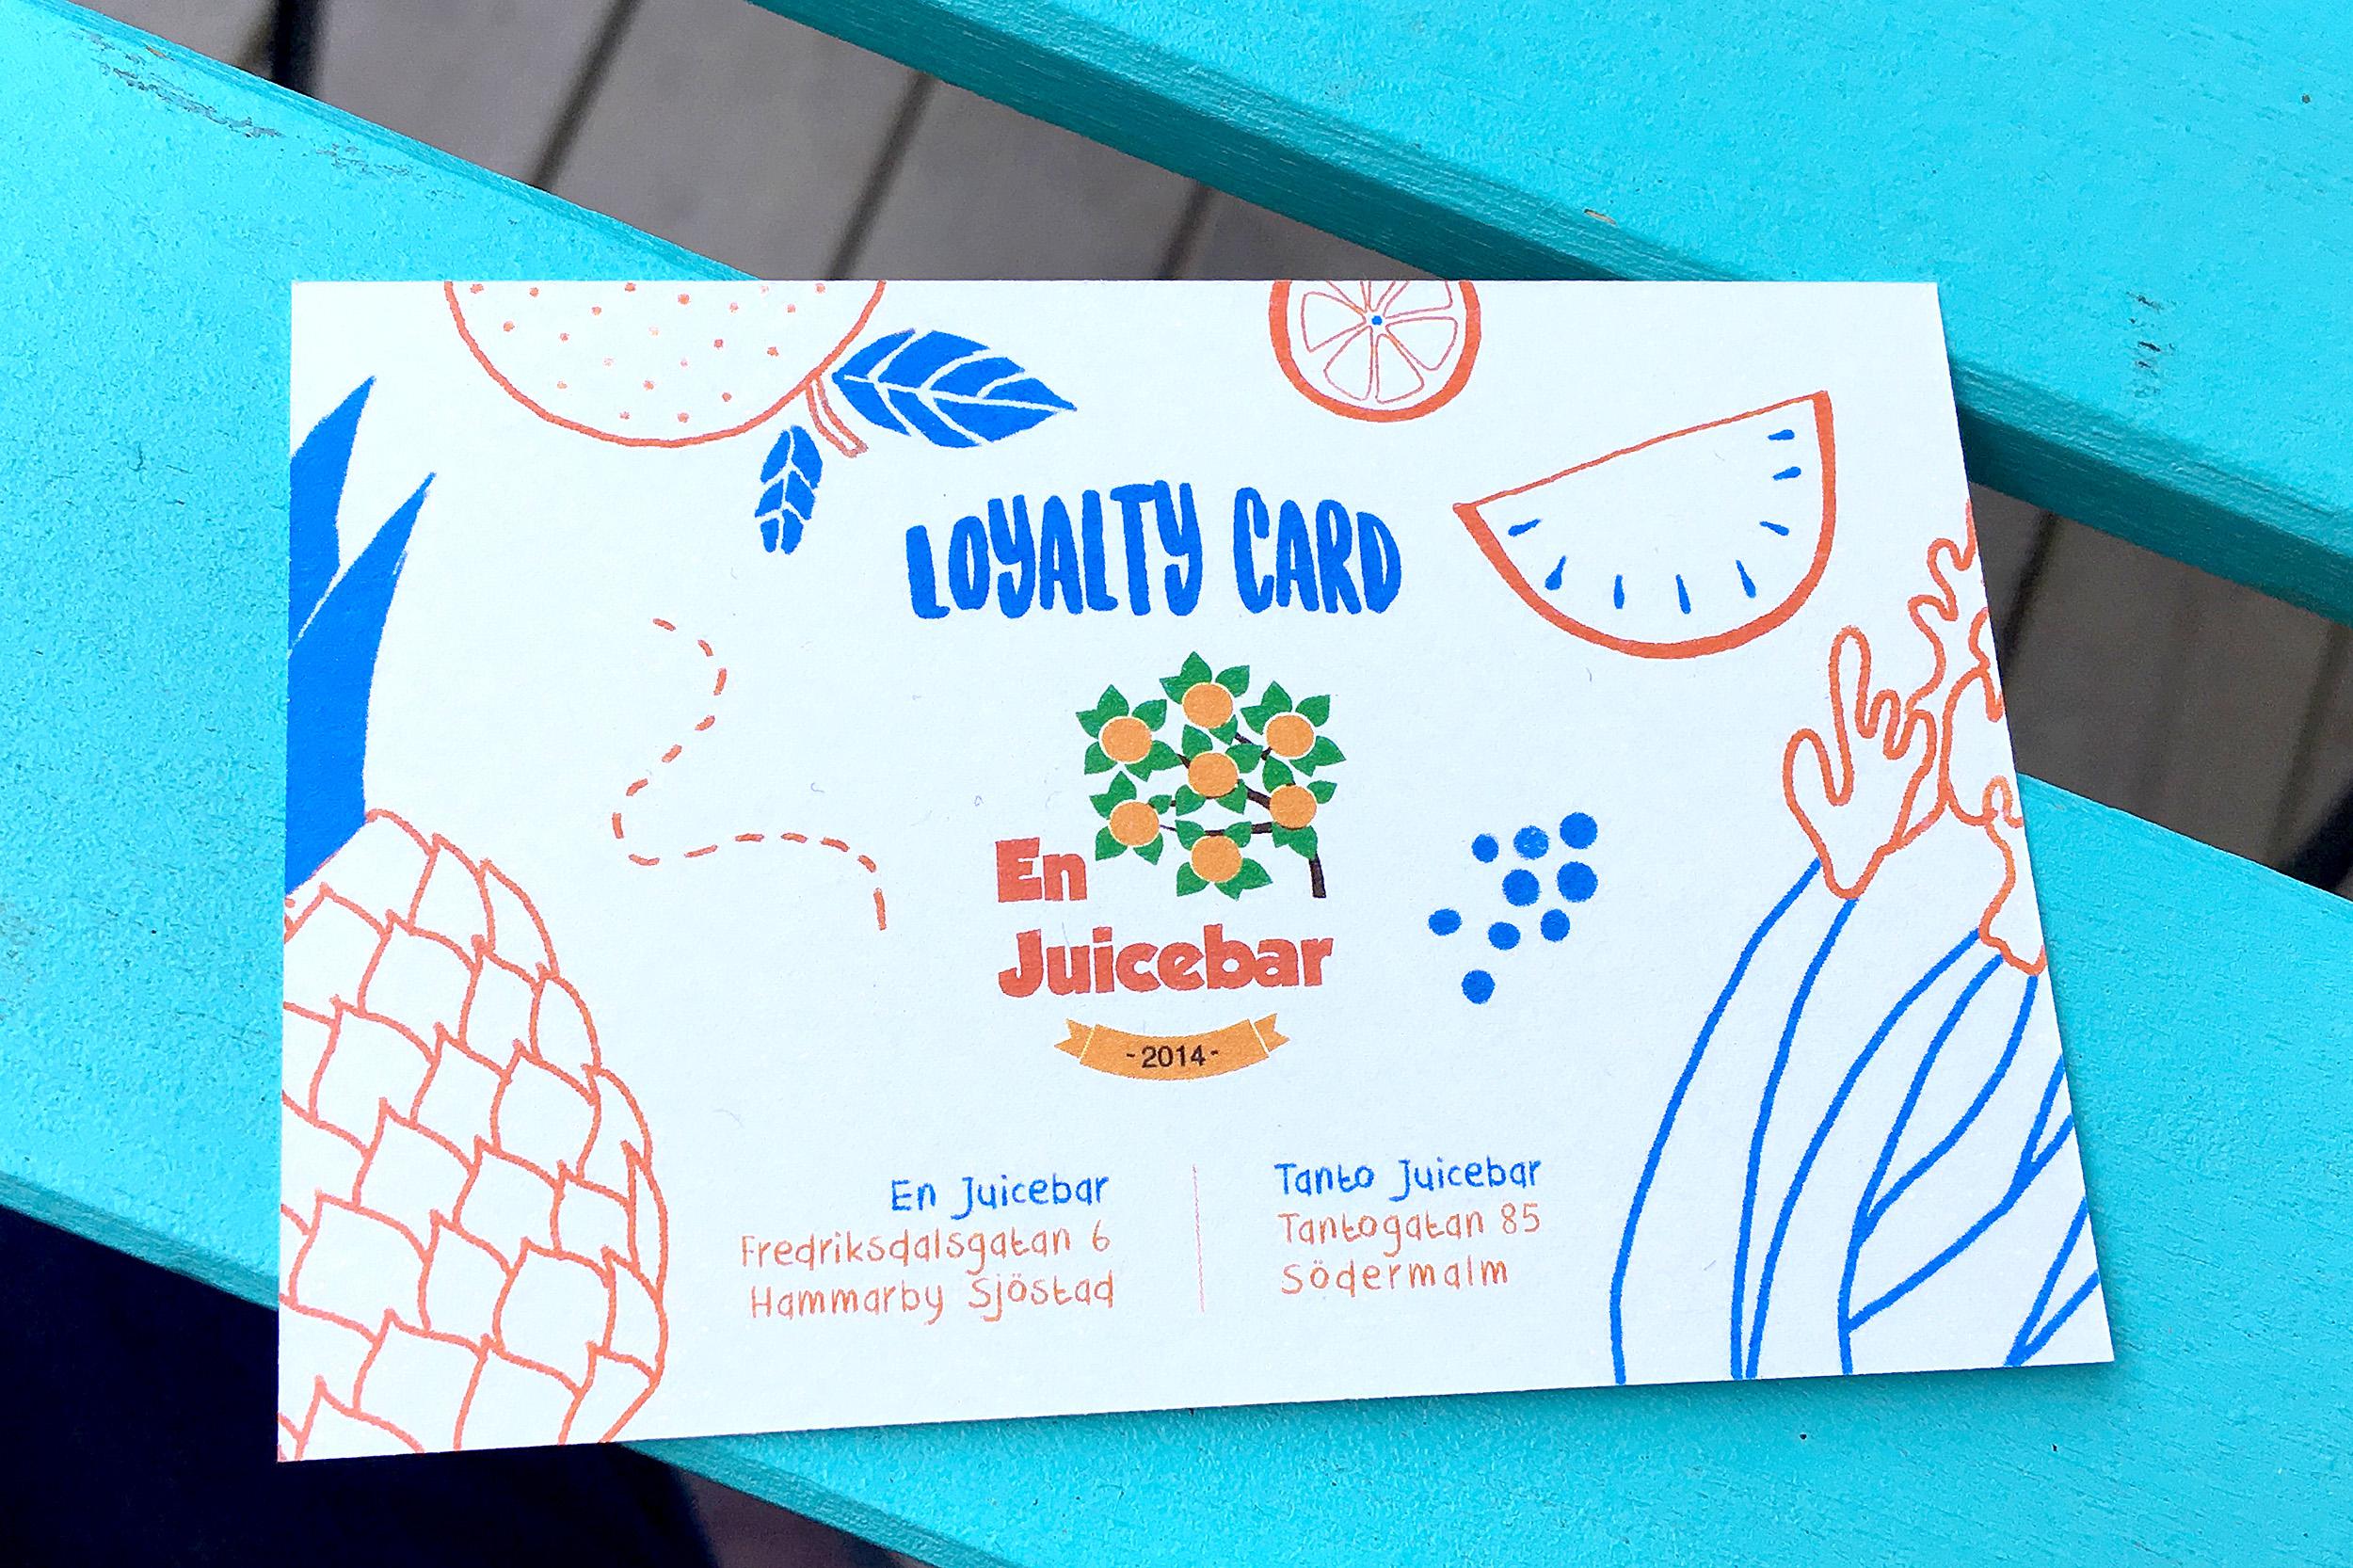 Loyalty Card En Juicebar